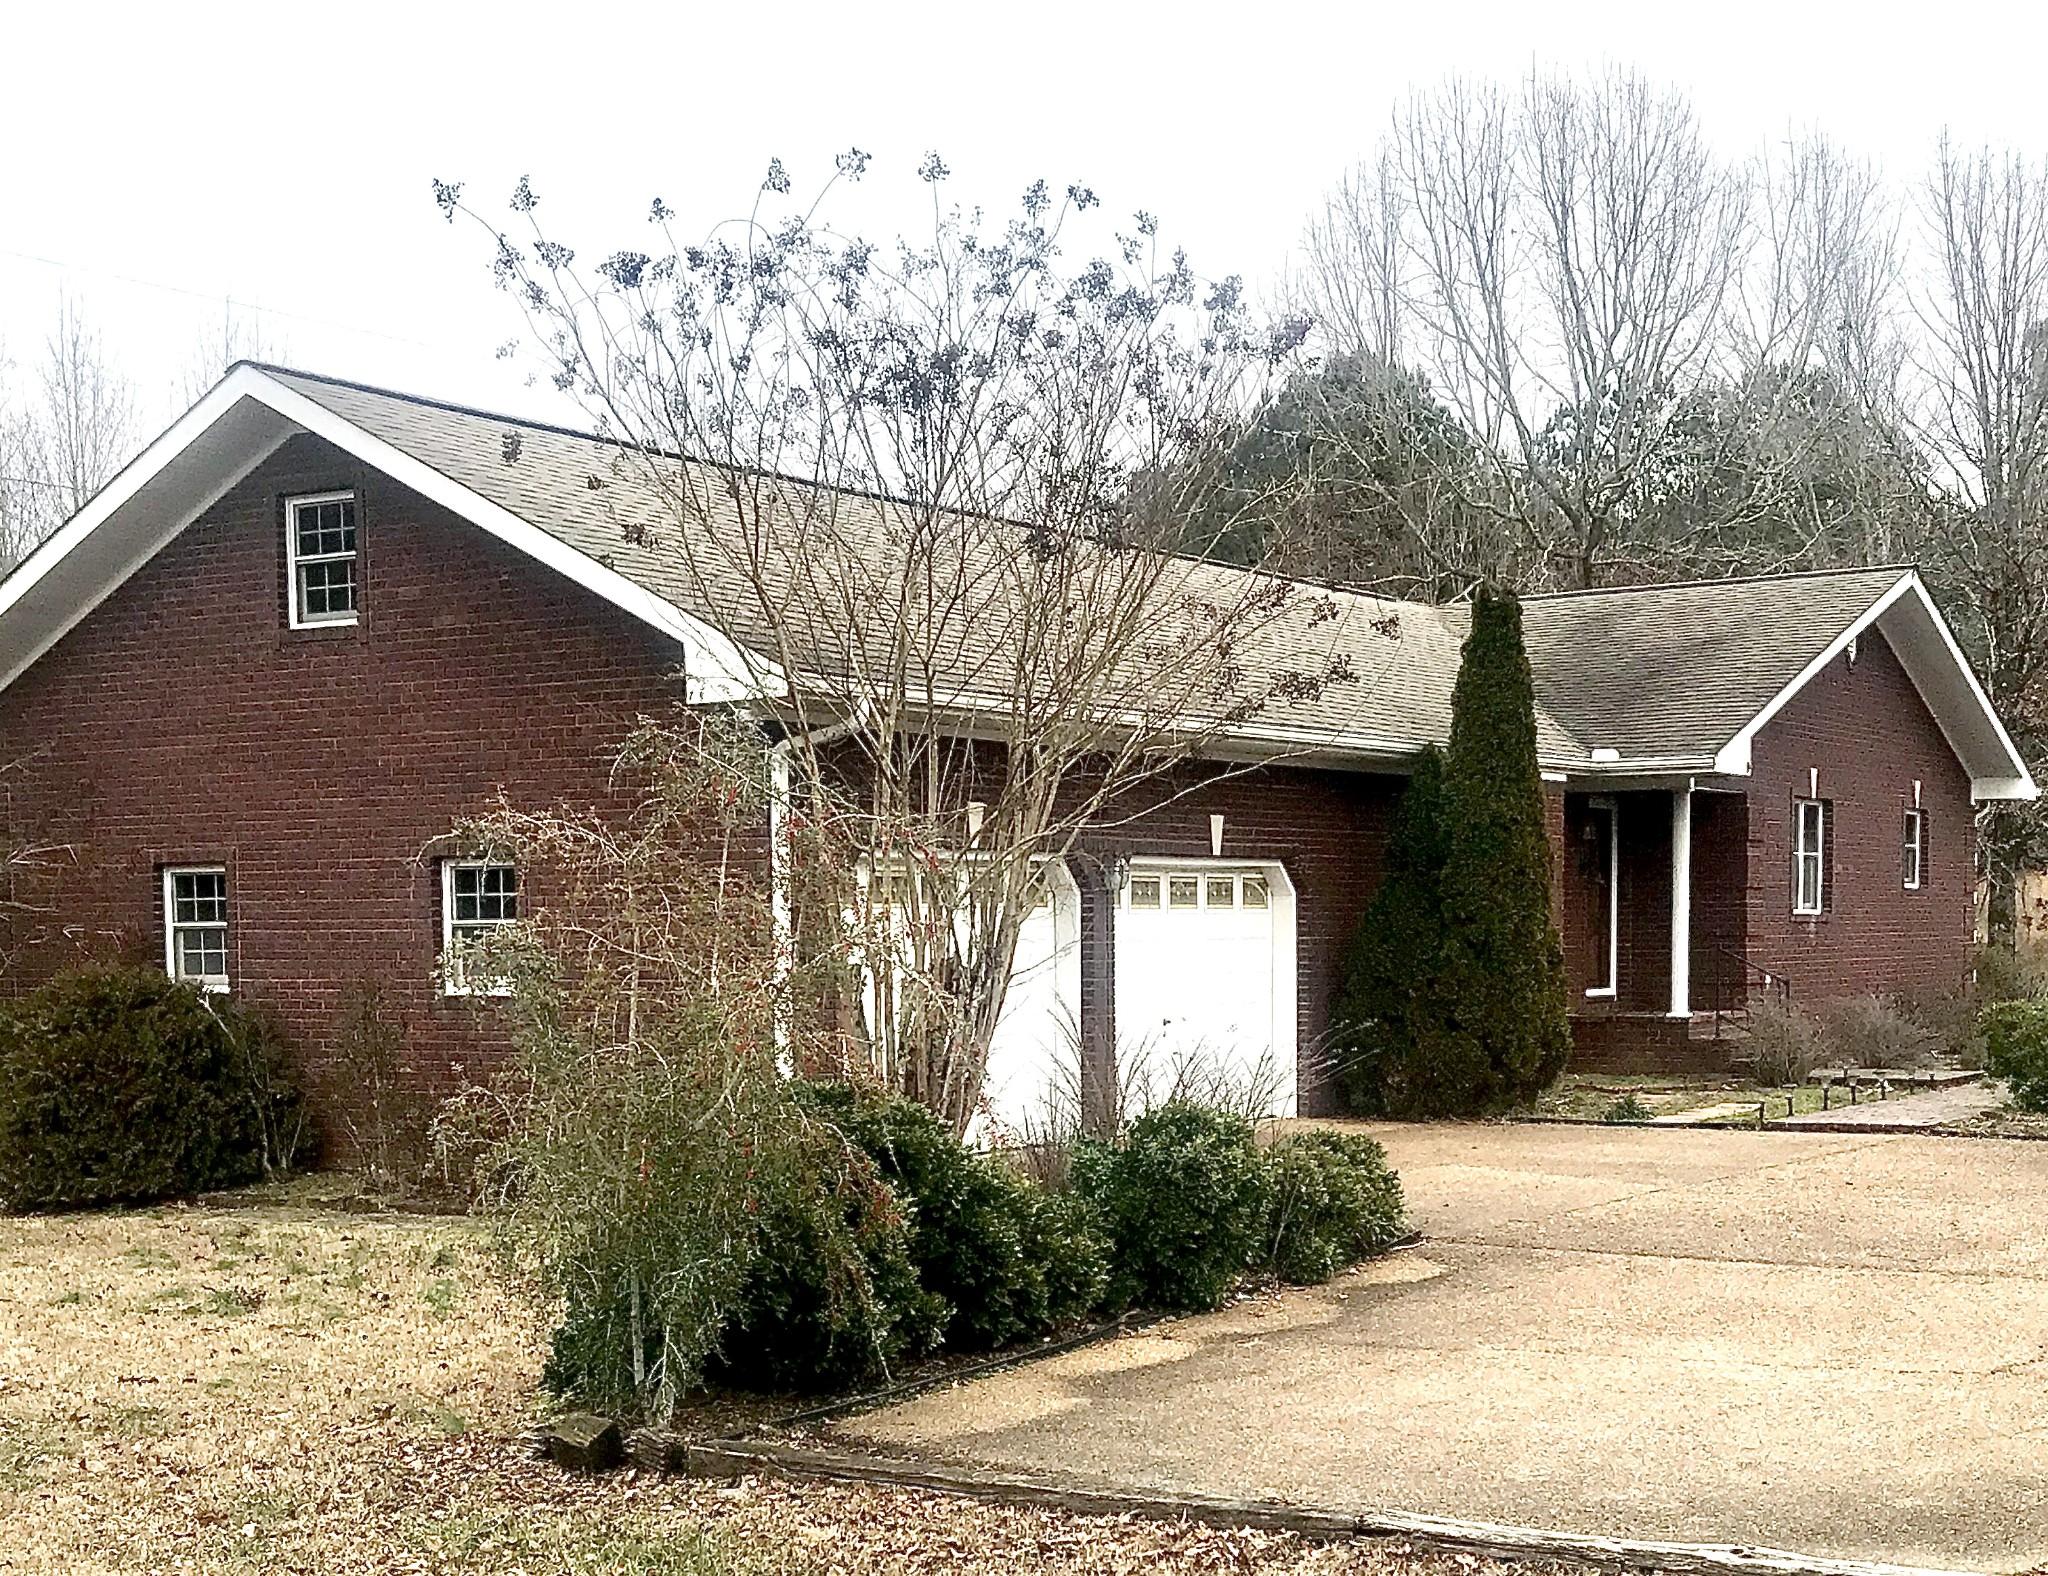 484 Allen Miller Ln, Parsons, TN 38363 - Parsons, TN real estate listing